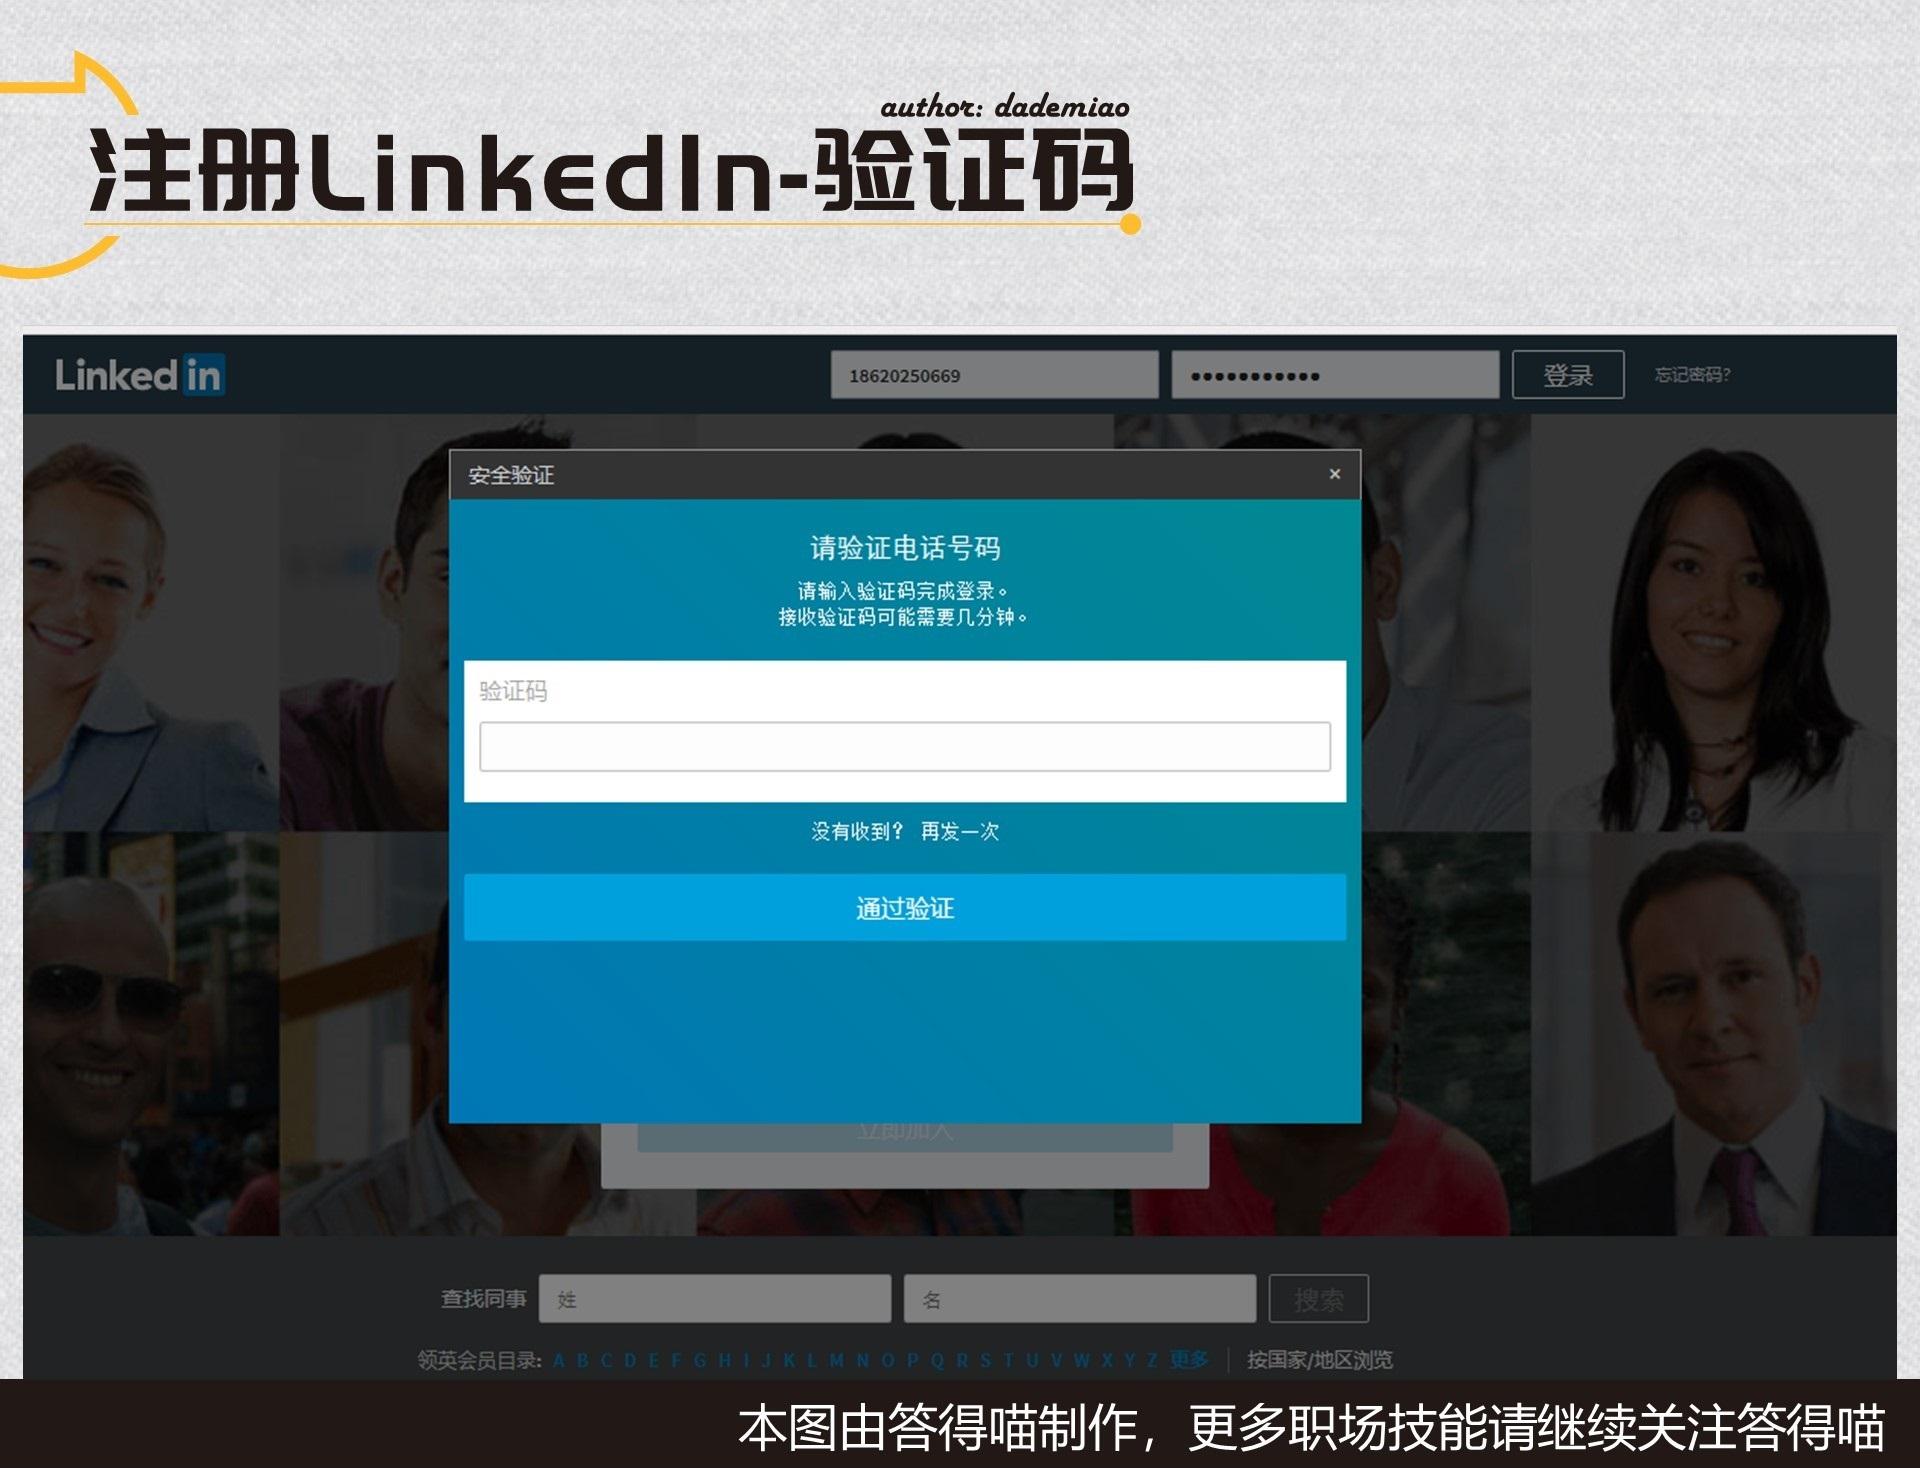 LinkedIn手机验证码界面